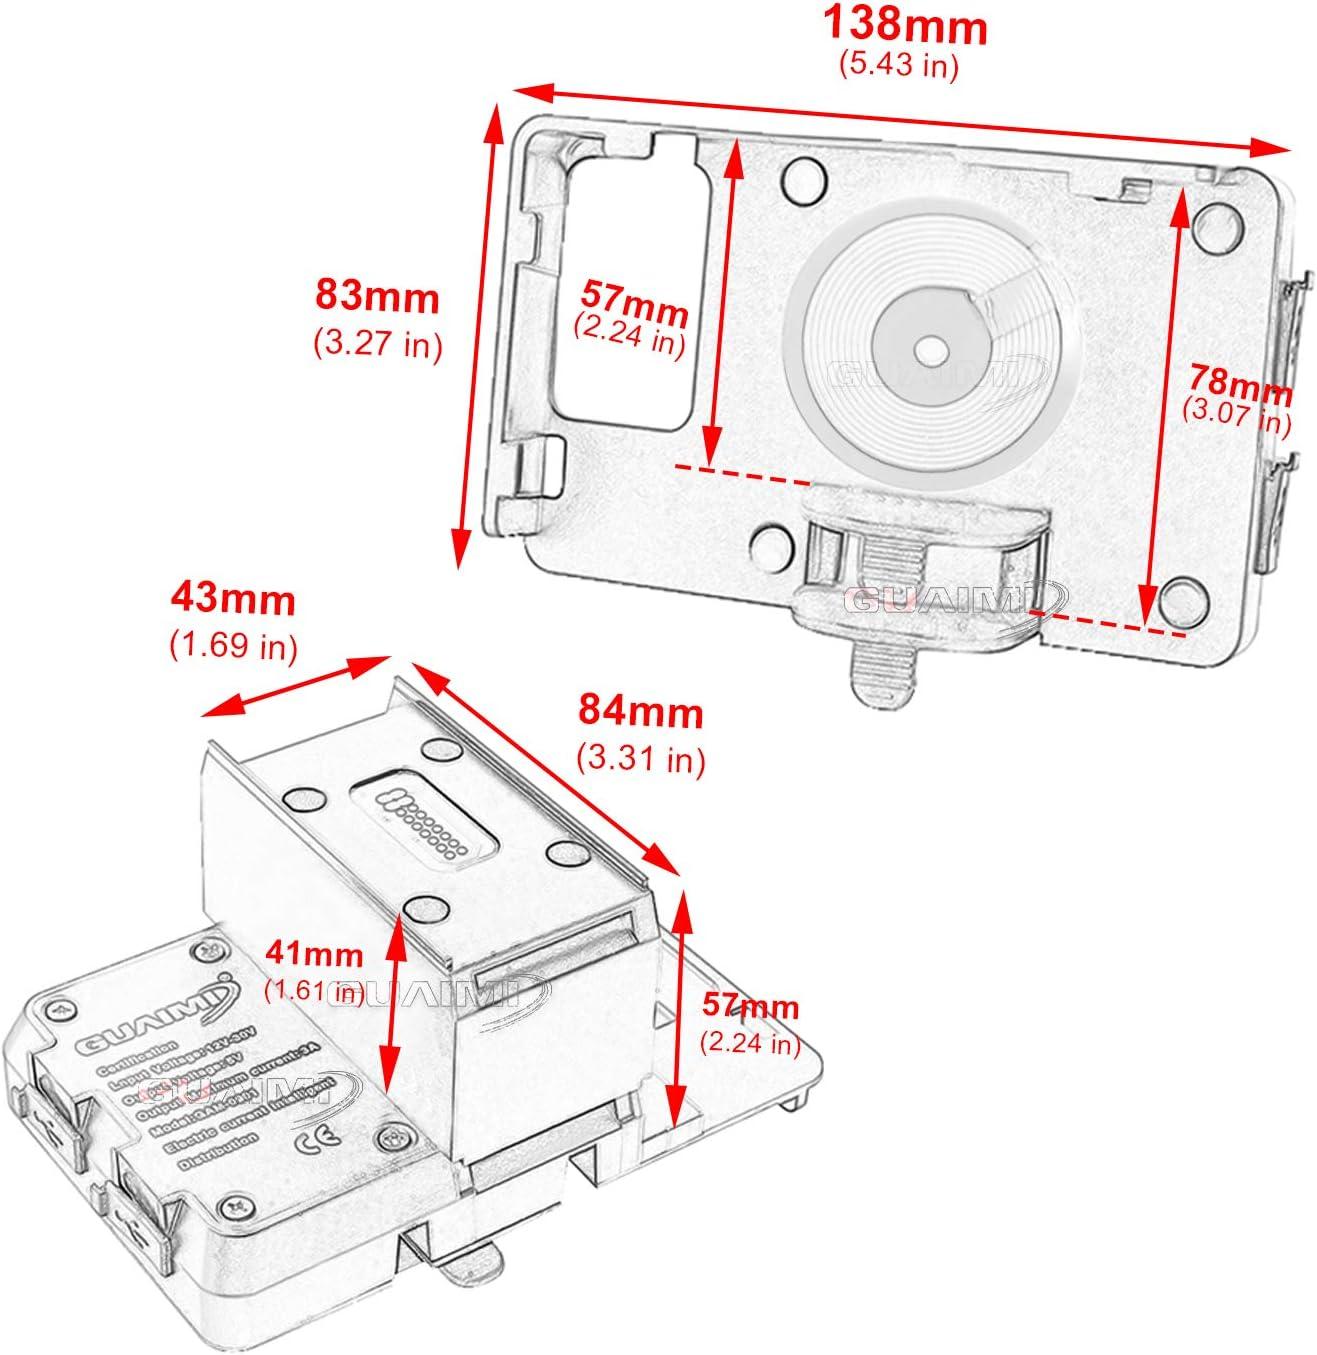 GUAIMI Motorrad Handyhalterung 2 in 1 Drahtloses und USB-Ladeger/ät Original GPS Navi Montage Handyhalterung Handyhalter Kompatibel mit B-MW R1200RT R1250RT 2014-2020